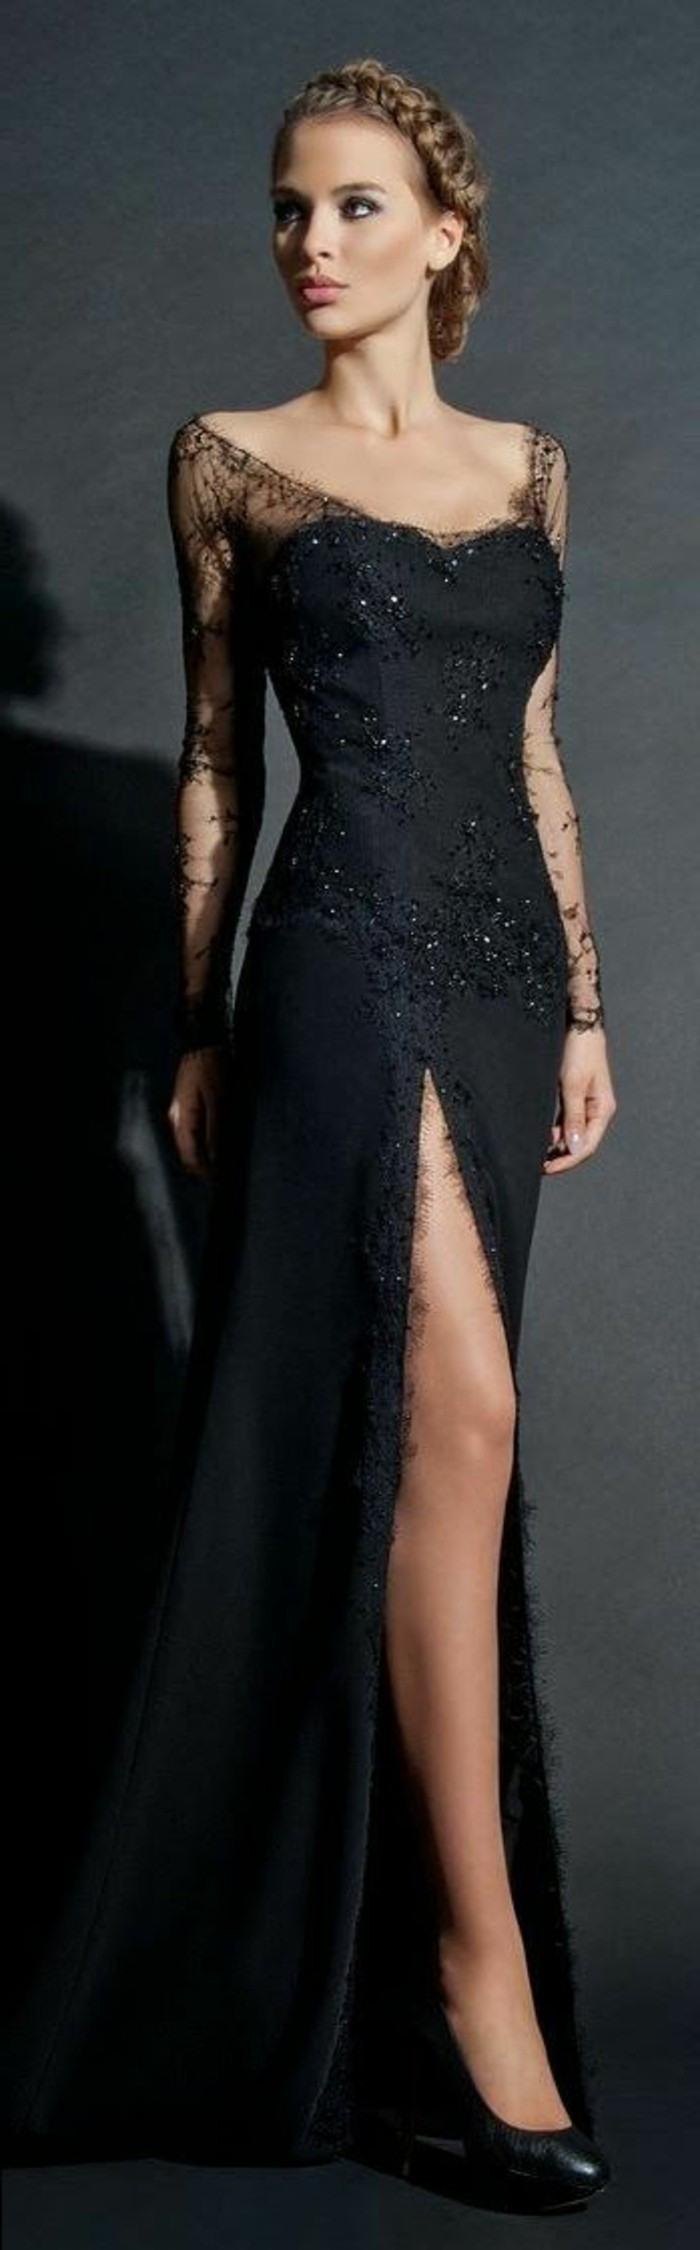 20 elegant abendkleid tattoo spitze galerie - abendkleid